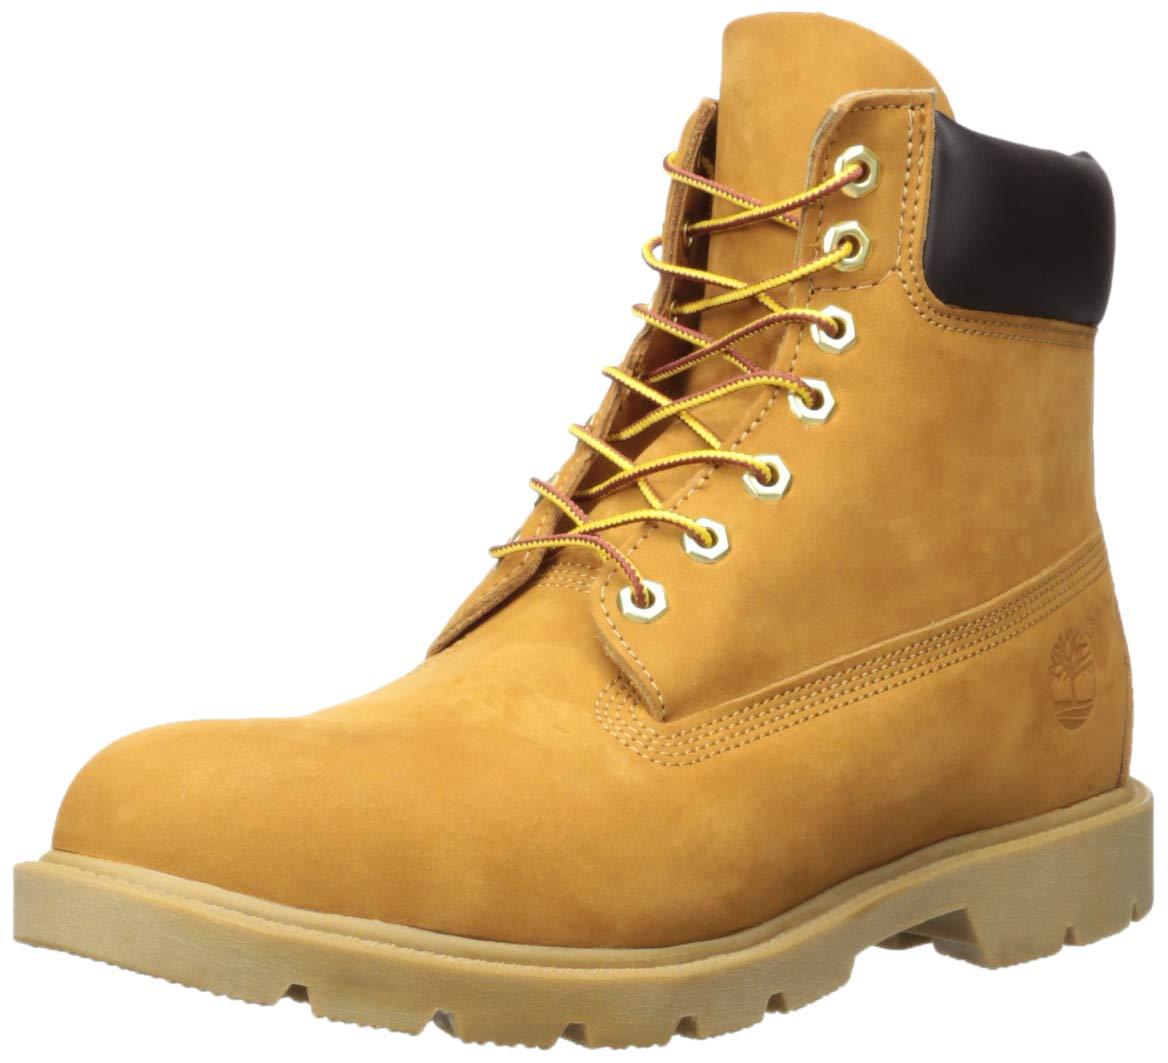 Timberland Basic Boot Contrast Collar Nubuck